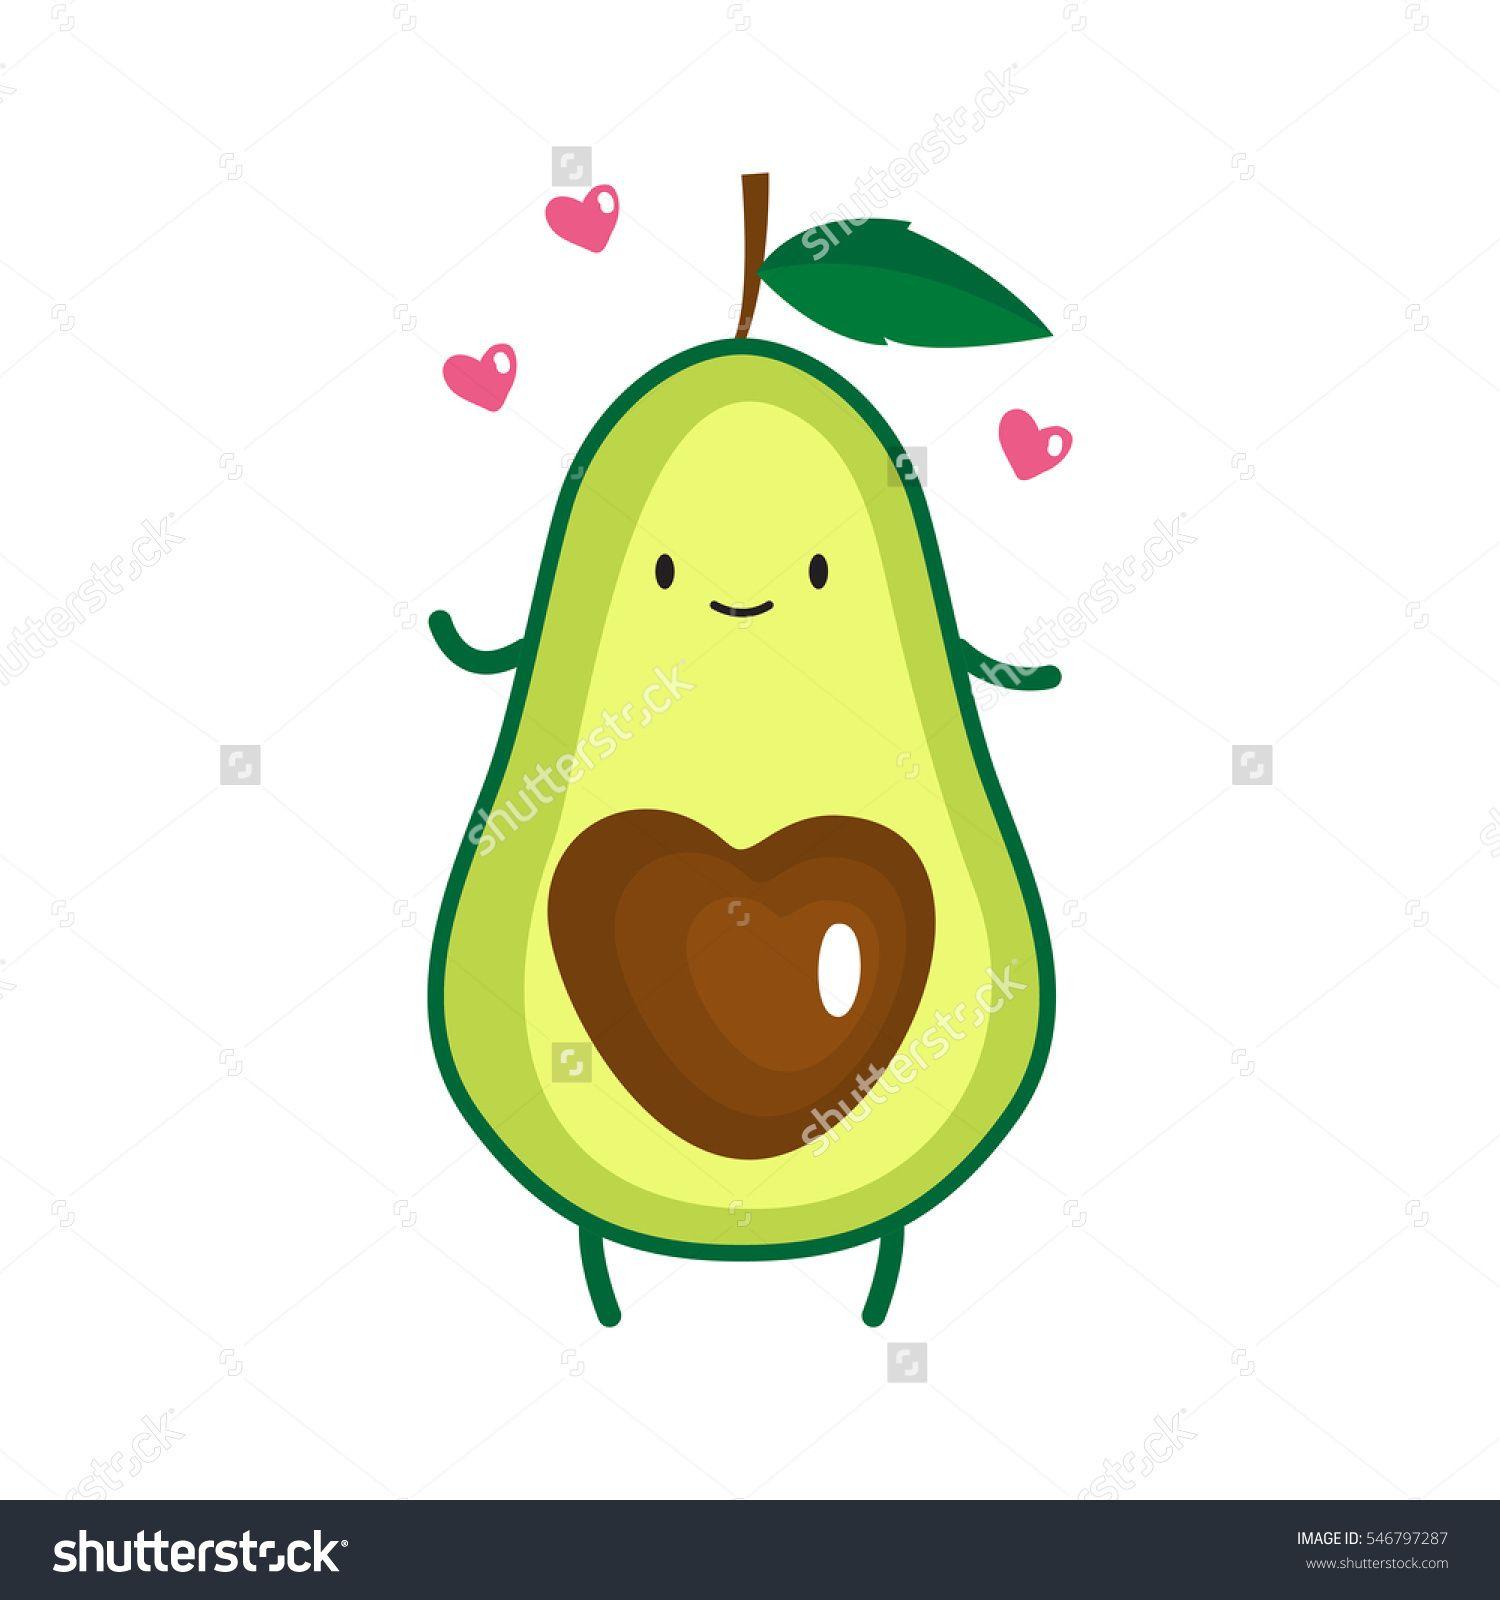 Avocado clipart printable. Illustration of cute vector